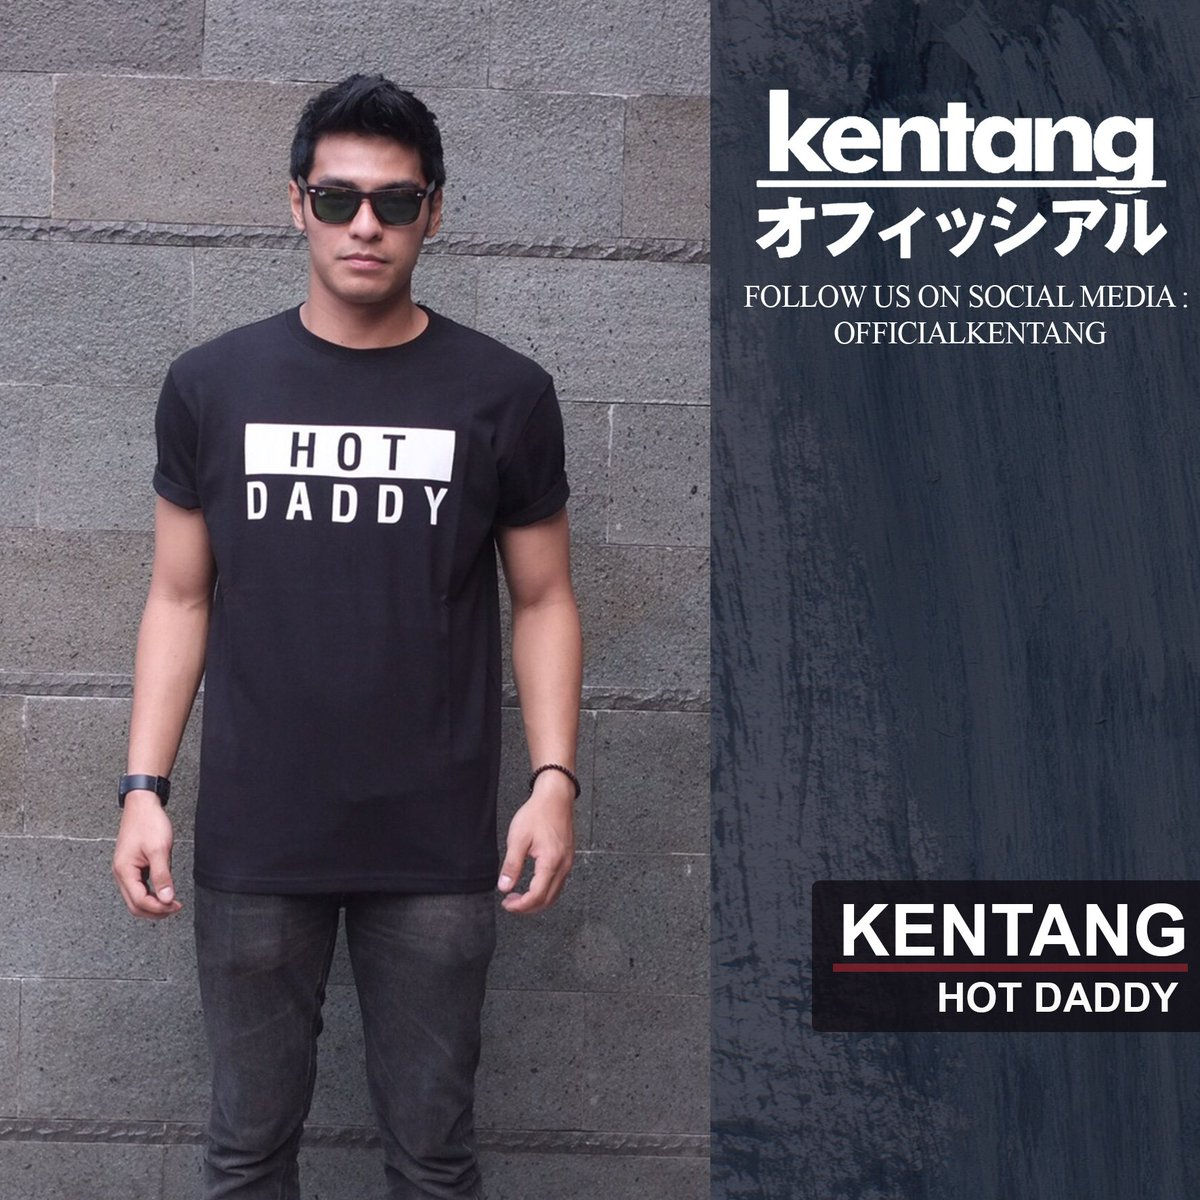 Kentang Official On Twitter Kentang Hot Daddy I 135k I